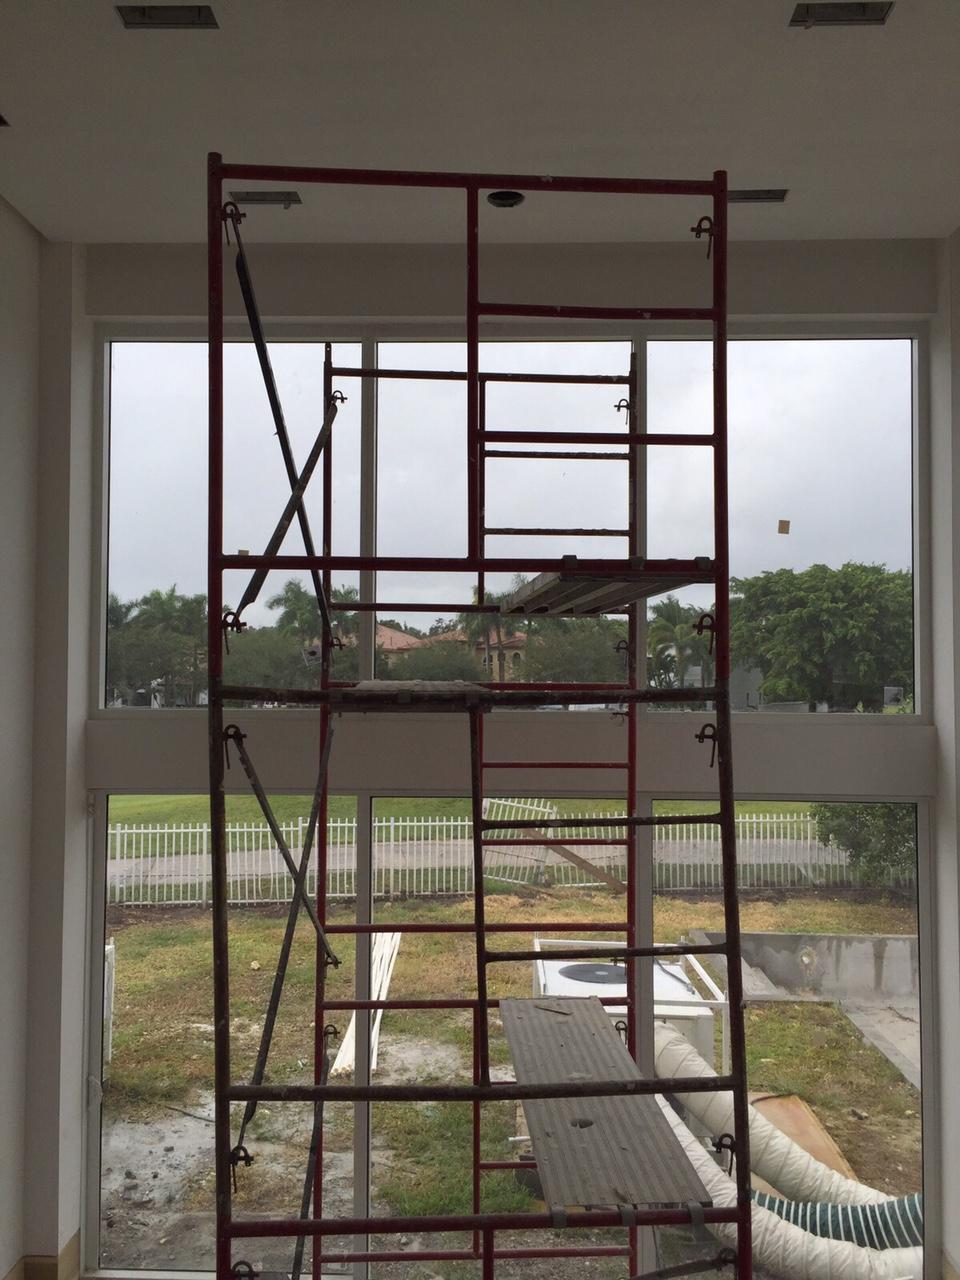 Miami General Contractors Interior Design Newman Construction Newman Brothers Construction